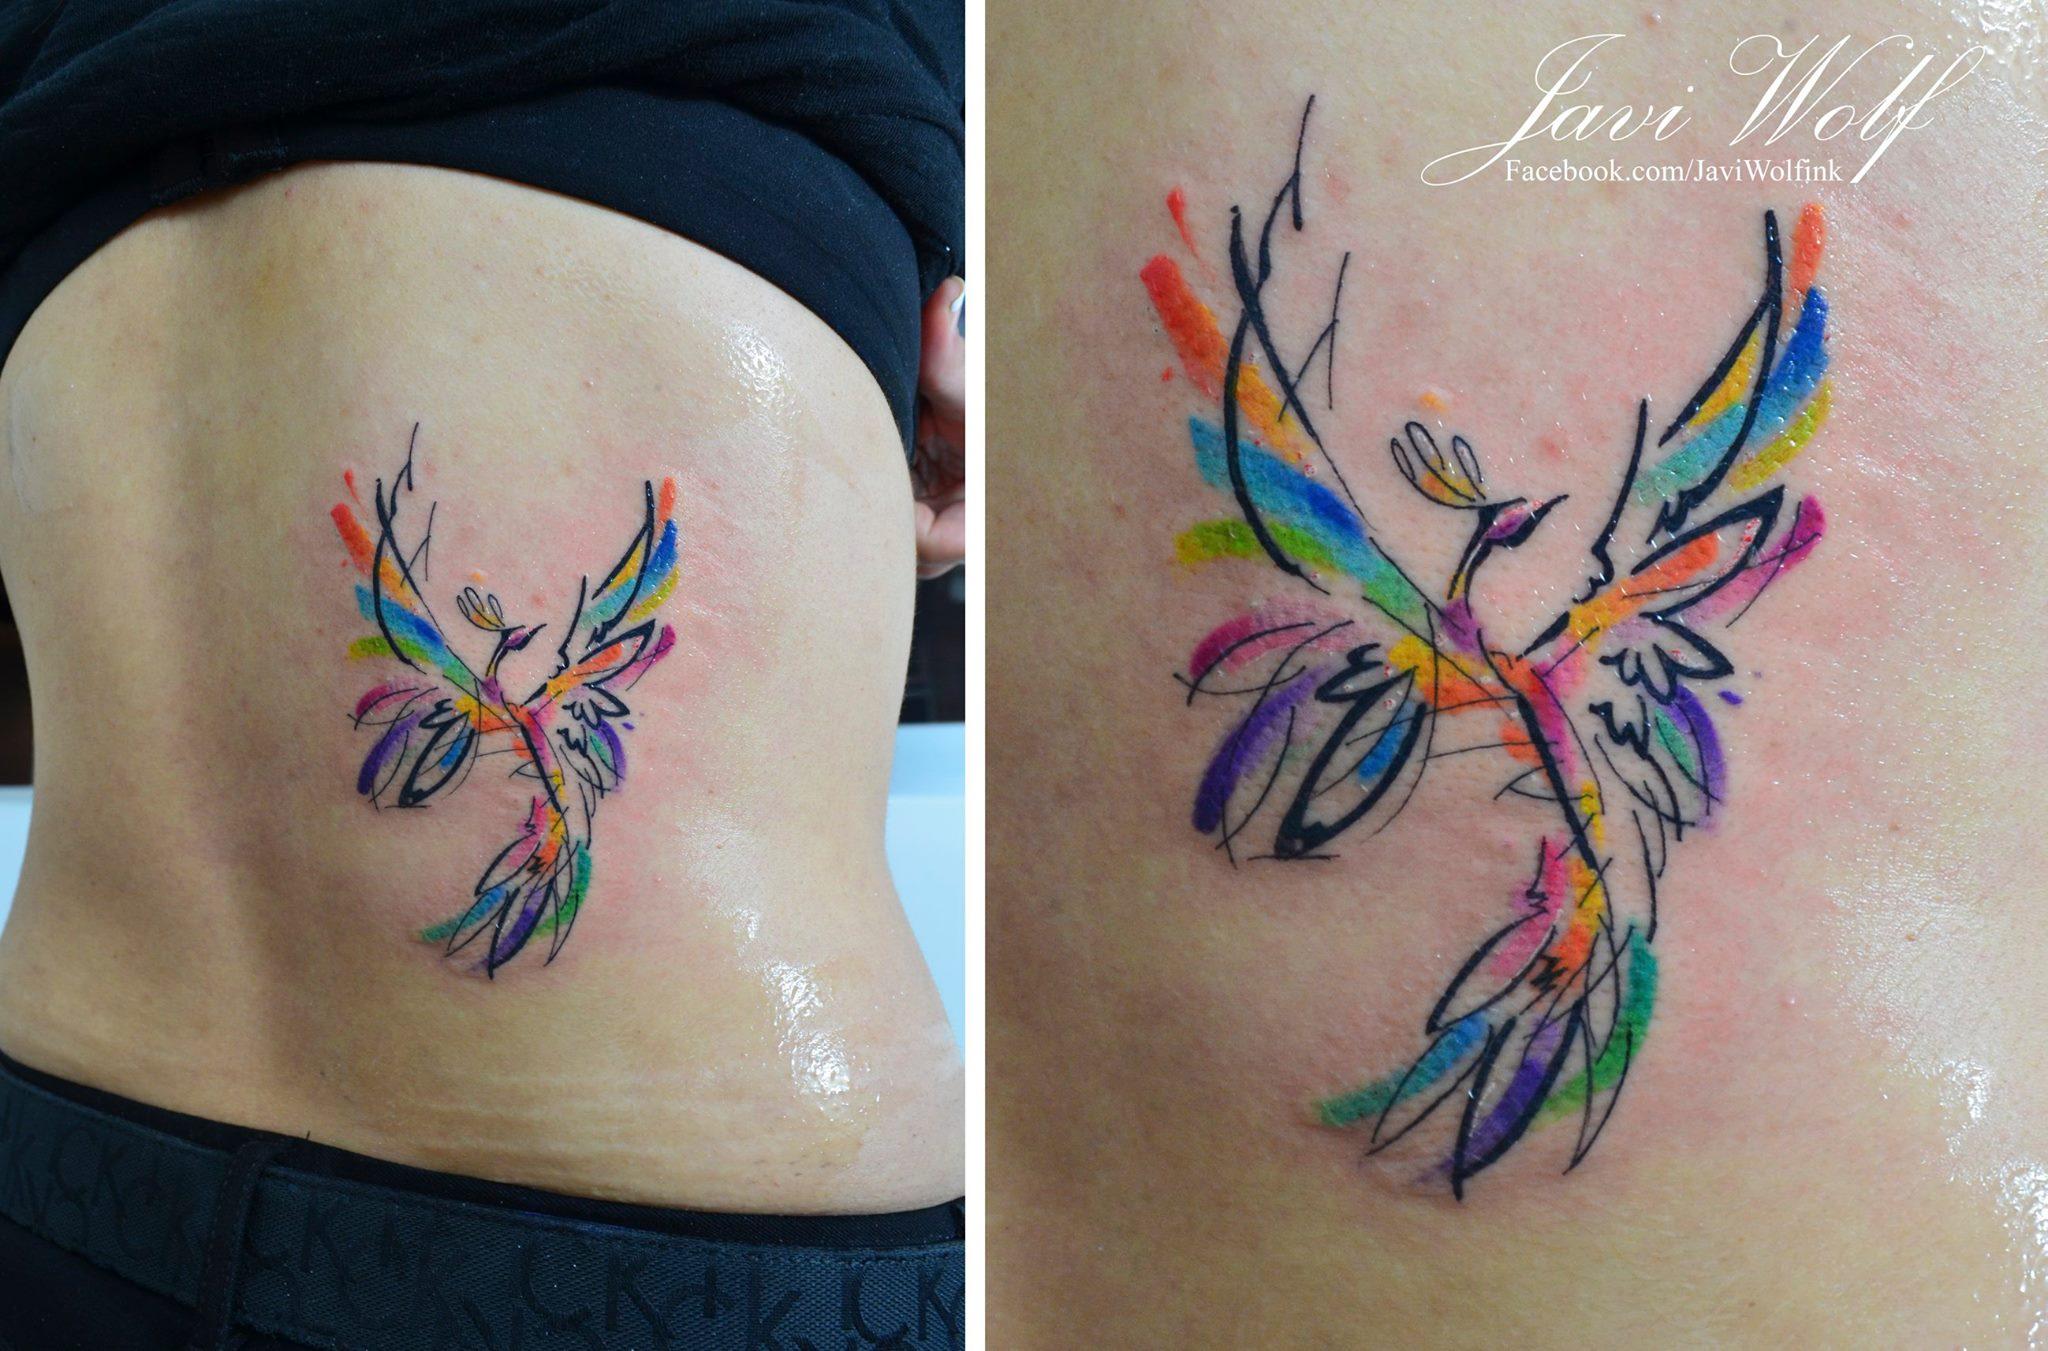 Ave Fénix Estilo Acuarelas Por Javi Wolf Tatuajes Para Mujeres